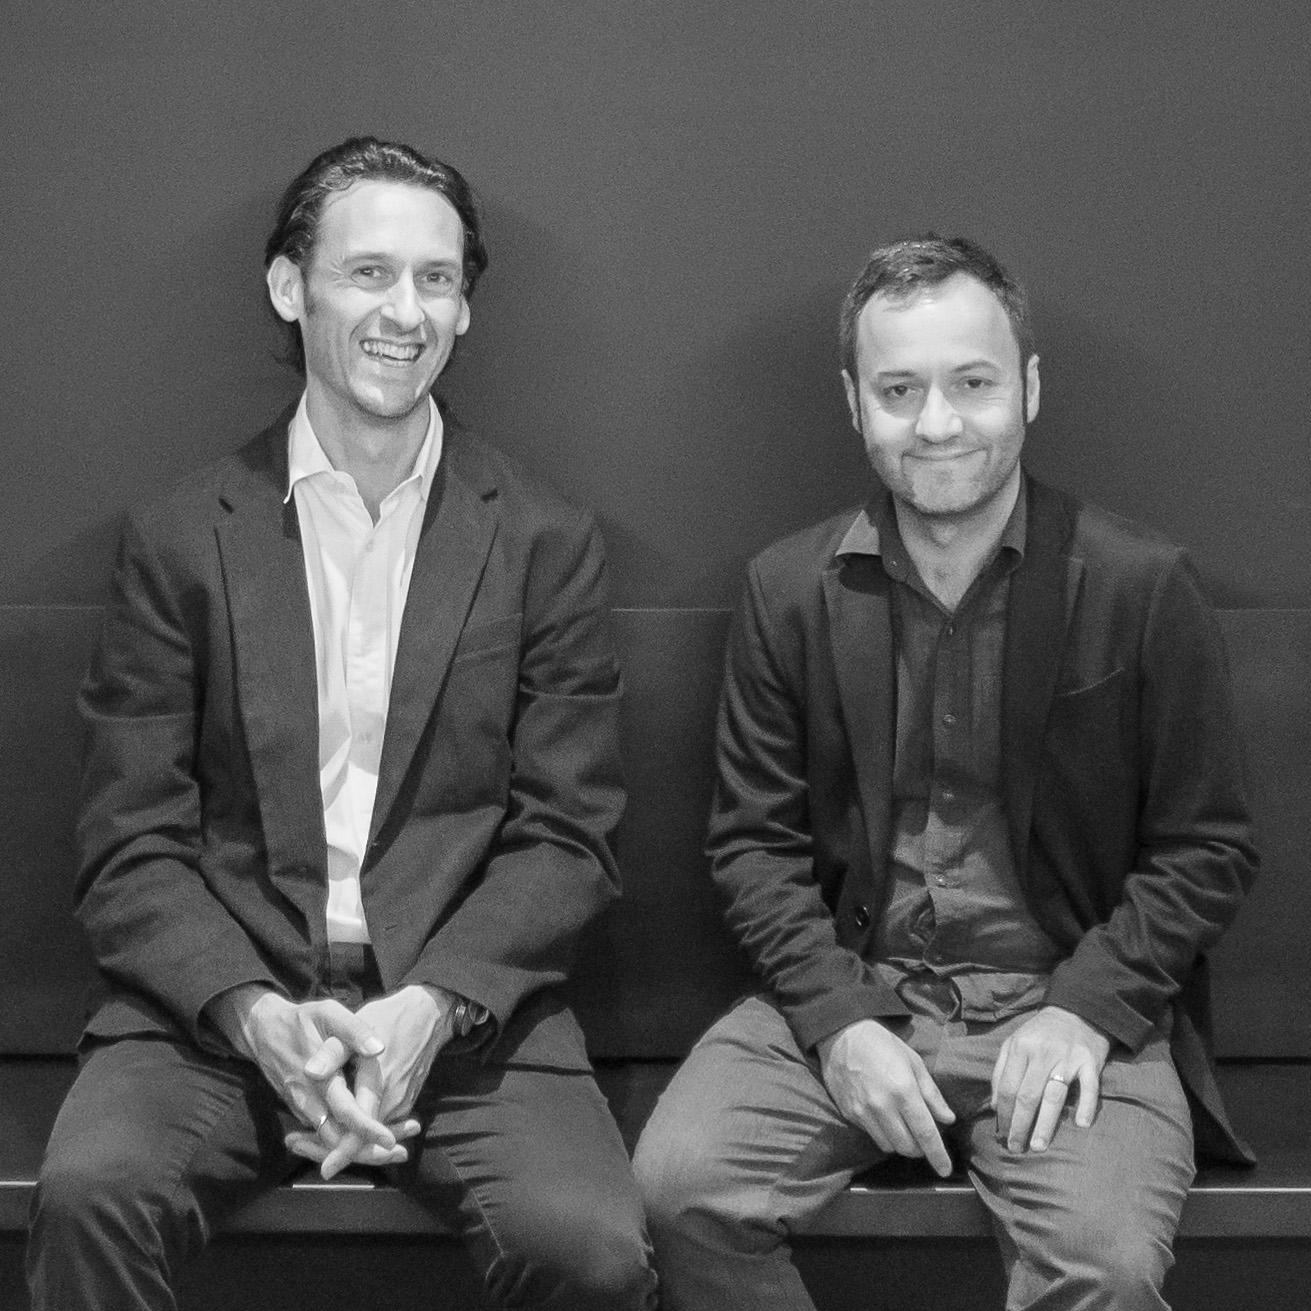 Photo of Directors, Matt and Jim